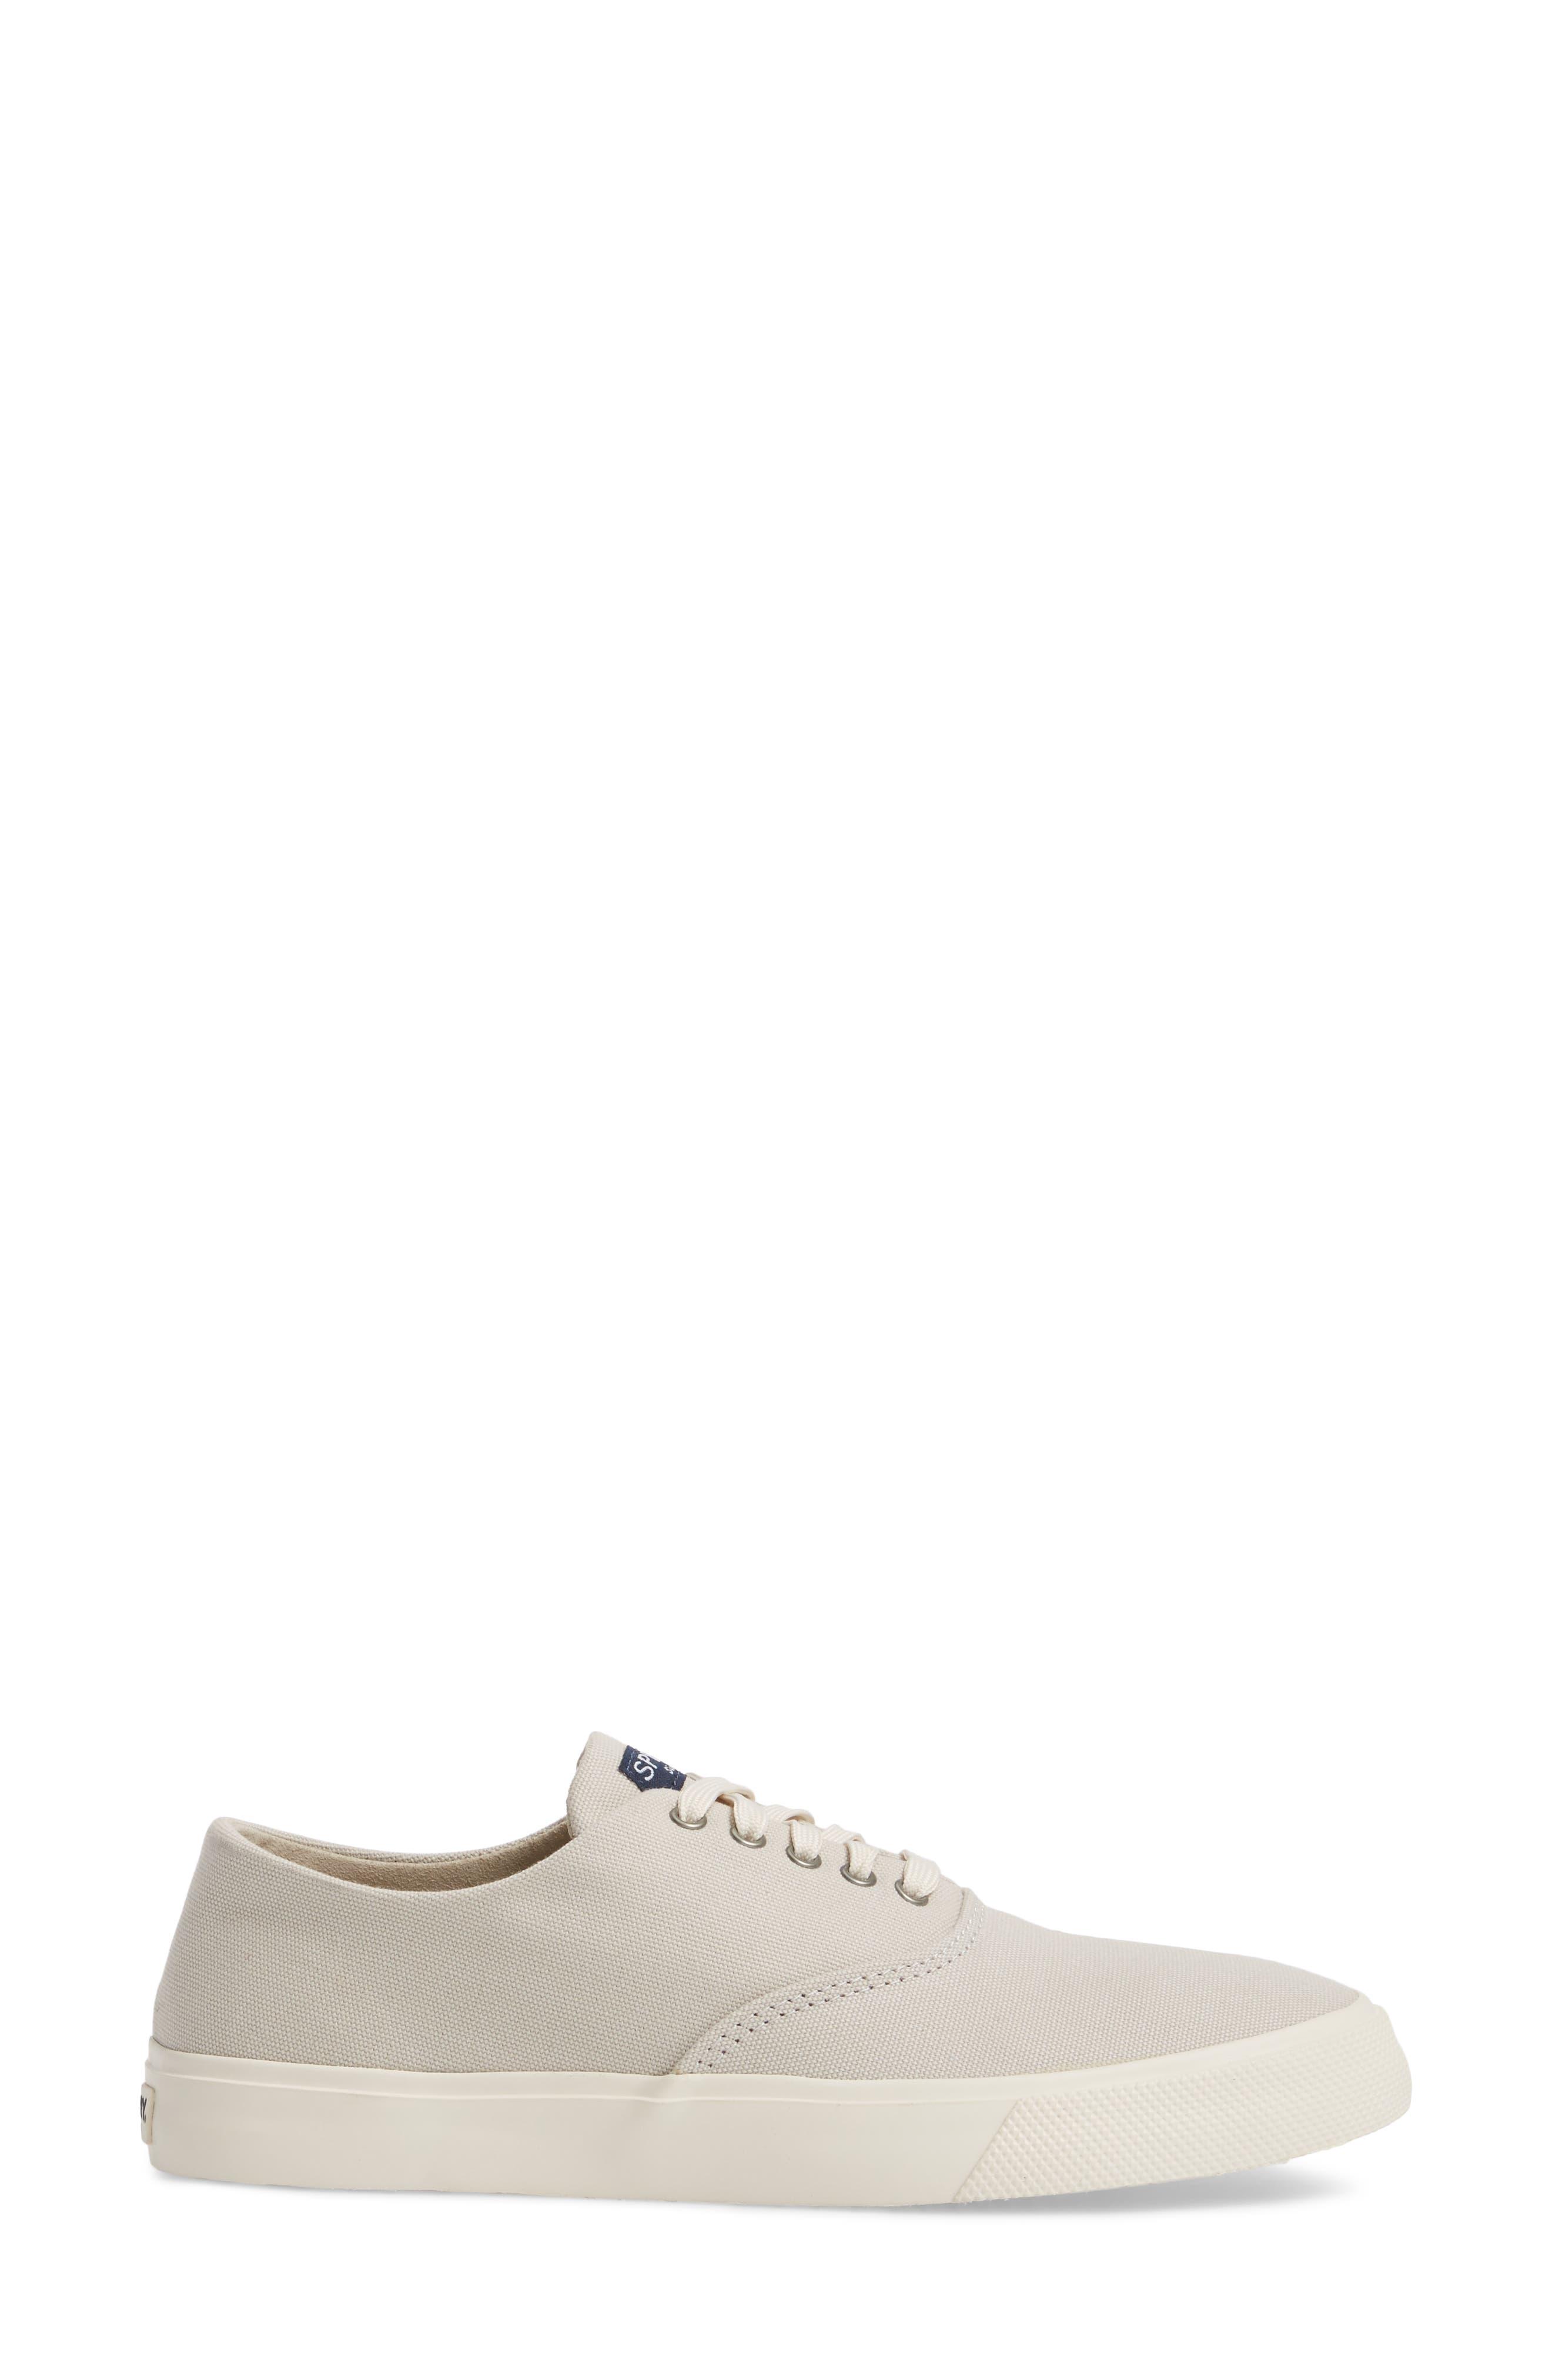 Captain's CVO Sneaker,                             Alternate thumbnail 3, color,                             050